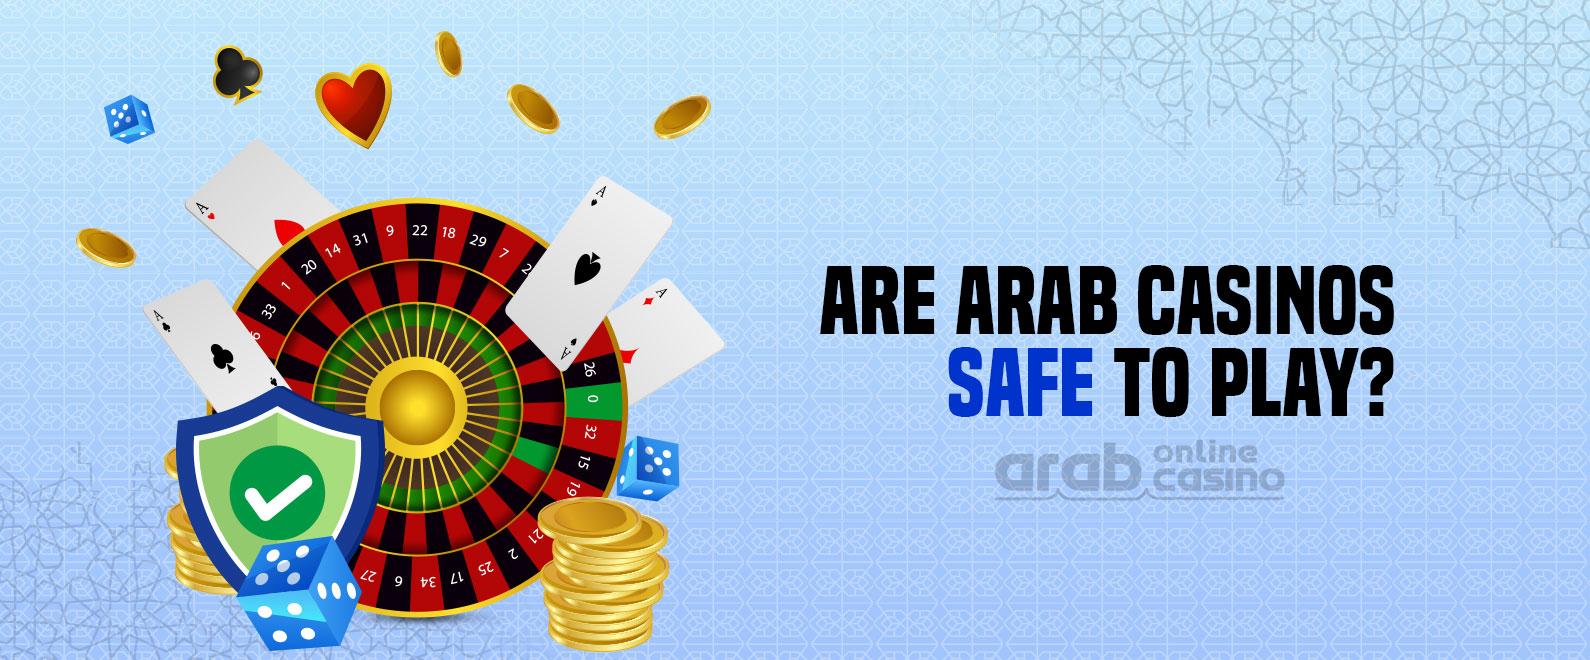 arab casino online is safe